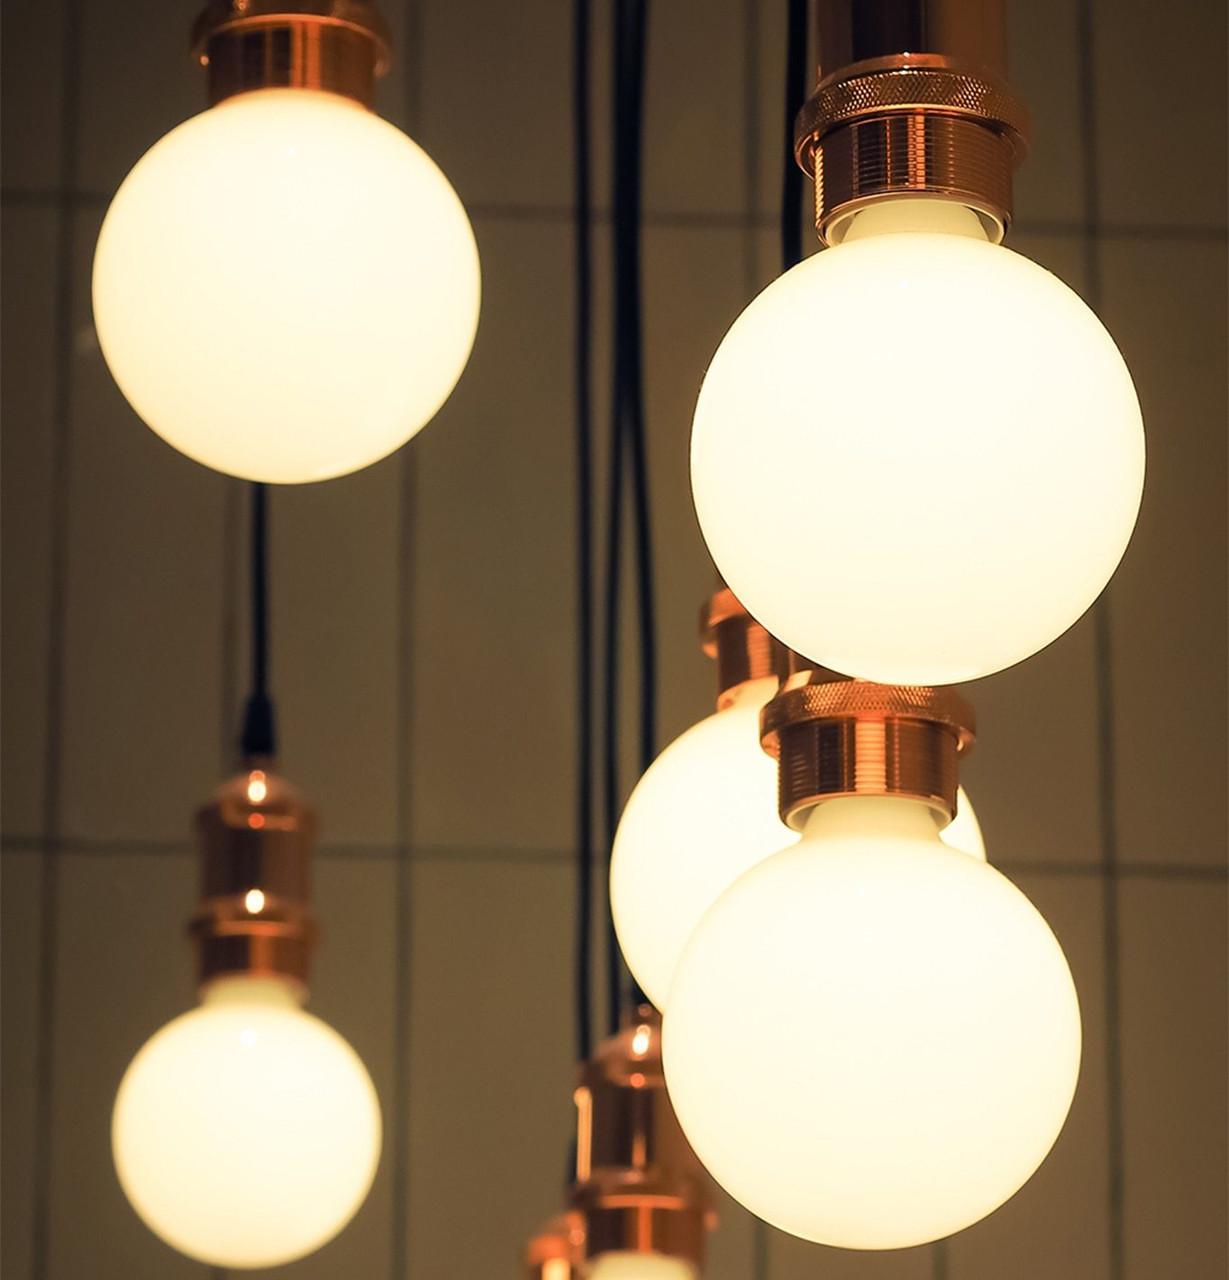 LED Dimmable G80 Screw Light Bulbs